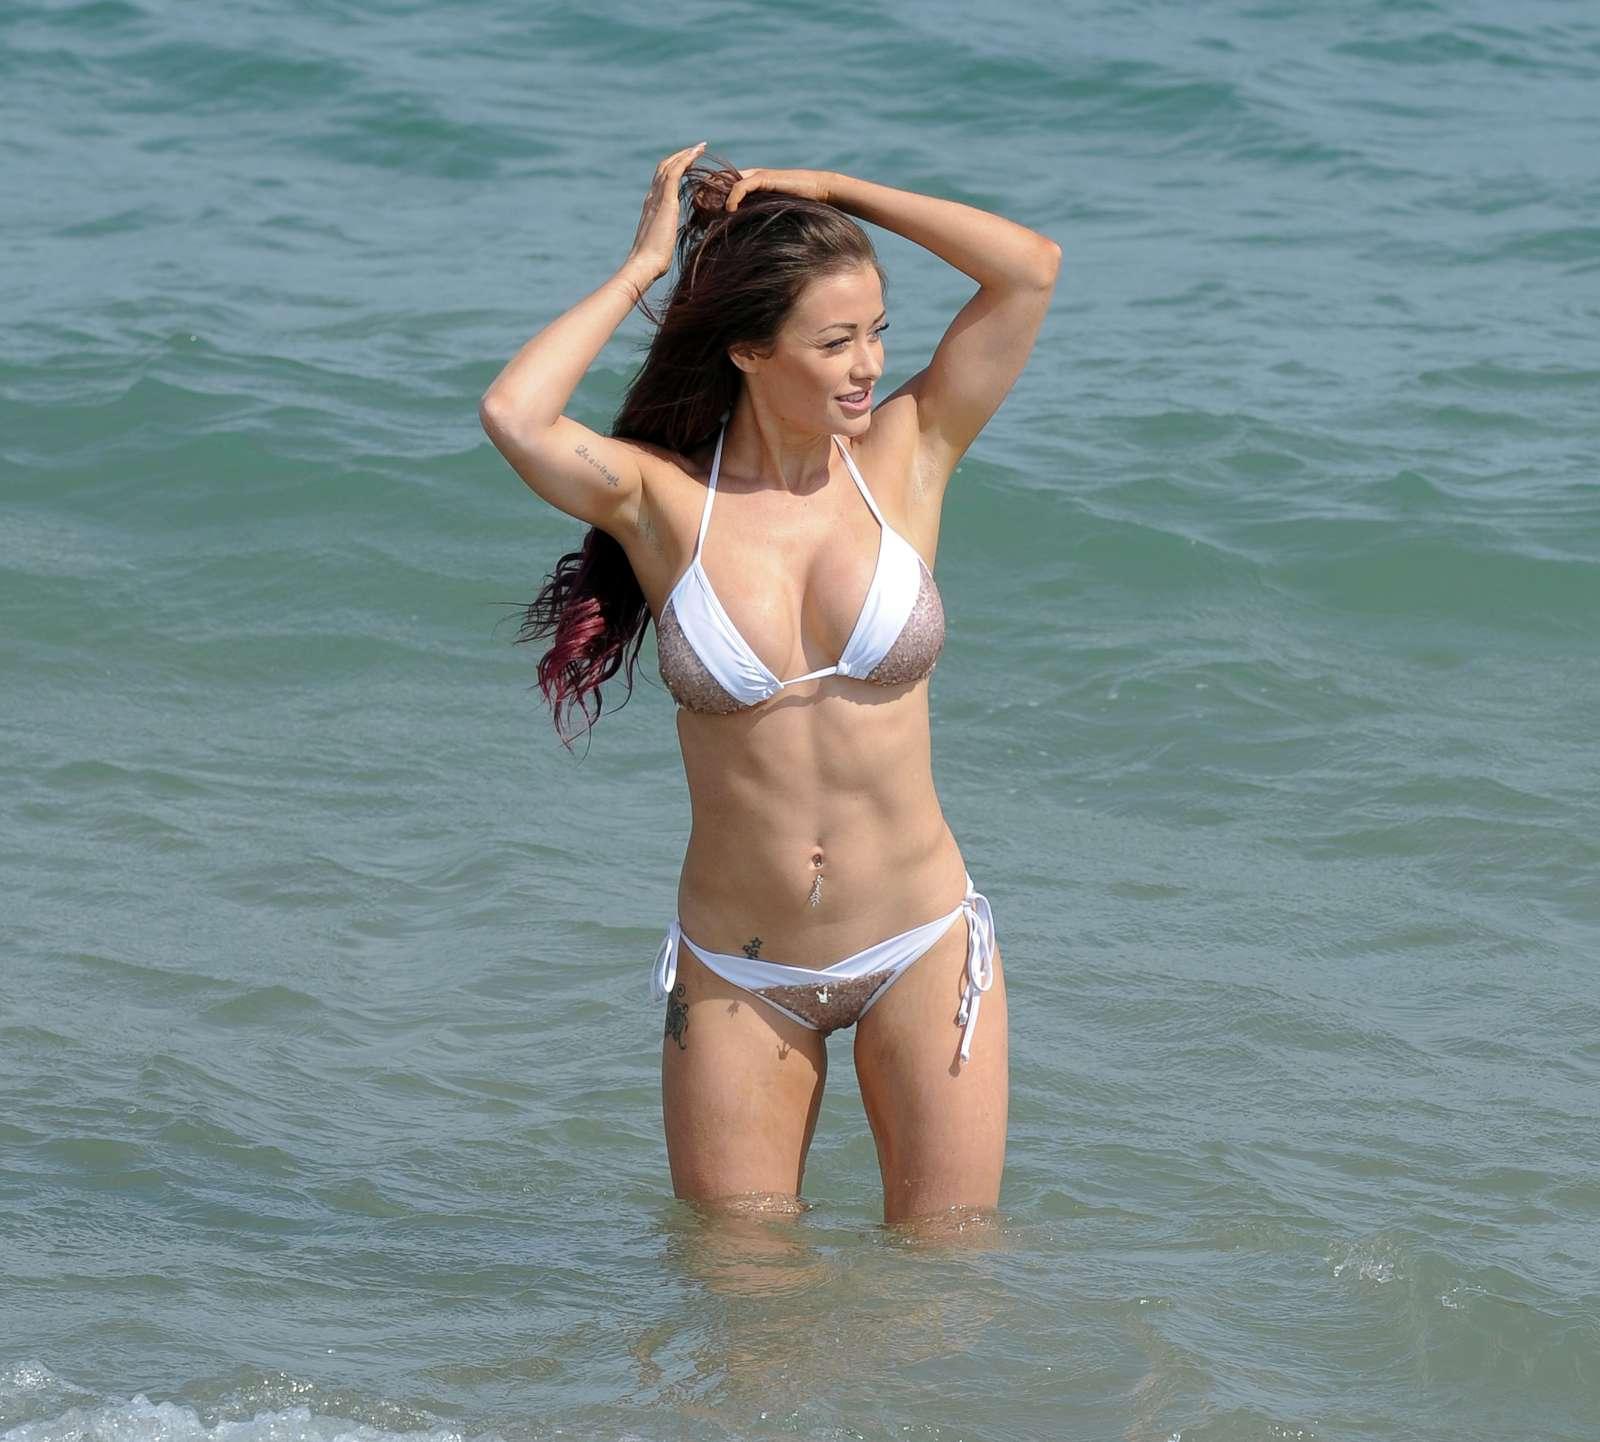 Jess Impiazzi In Bikini 2018 -30